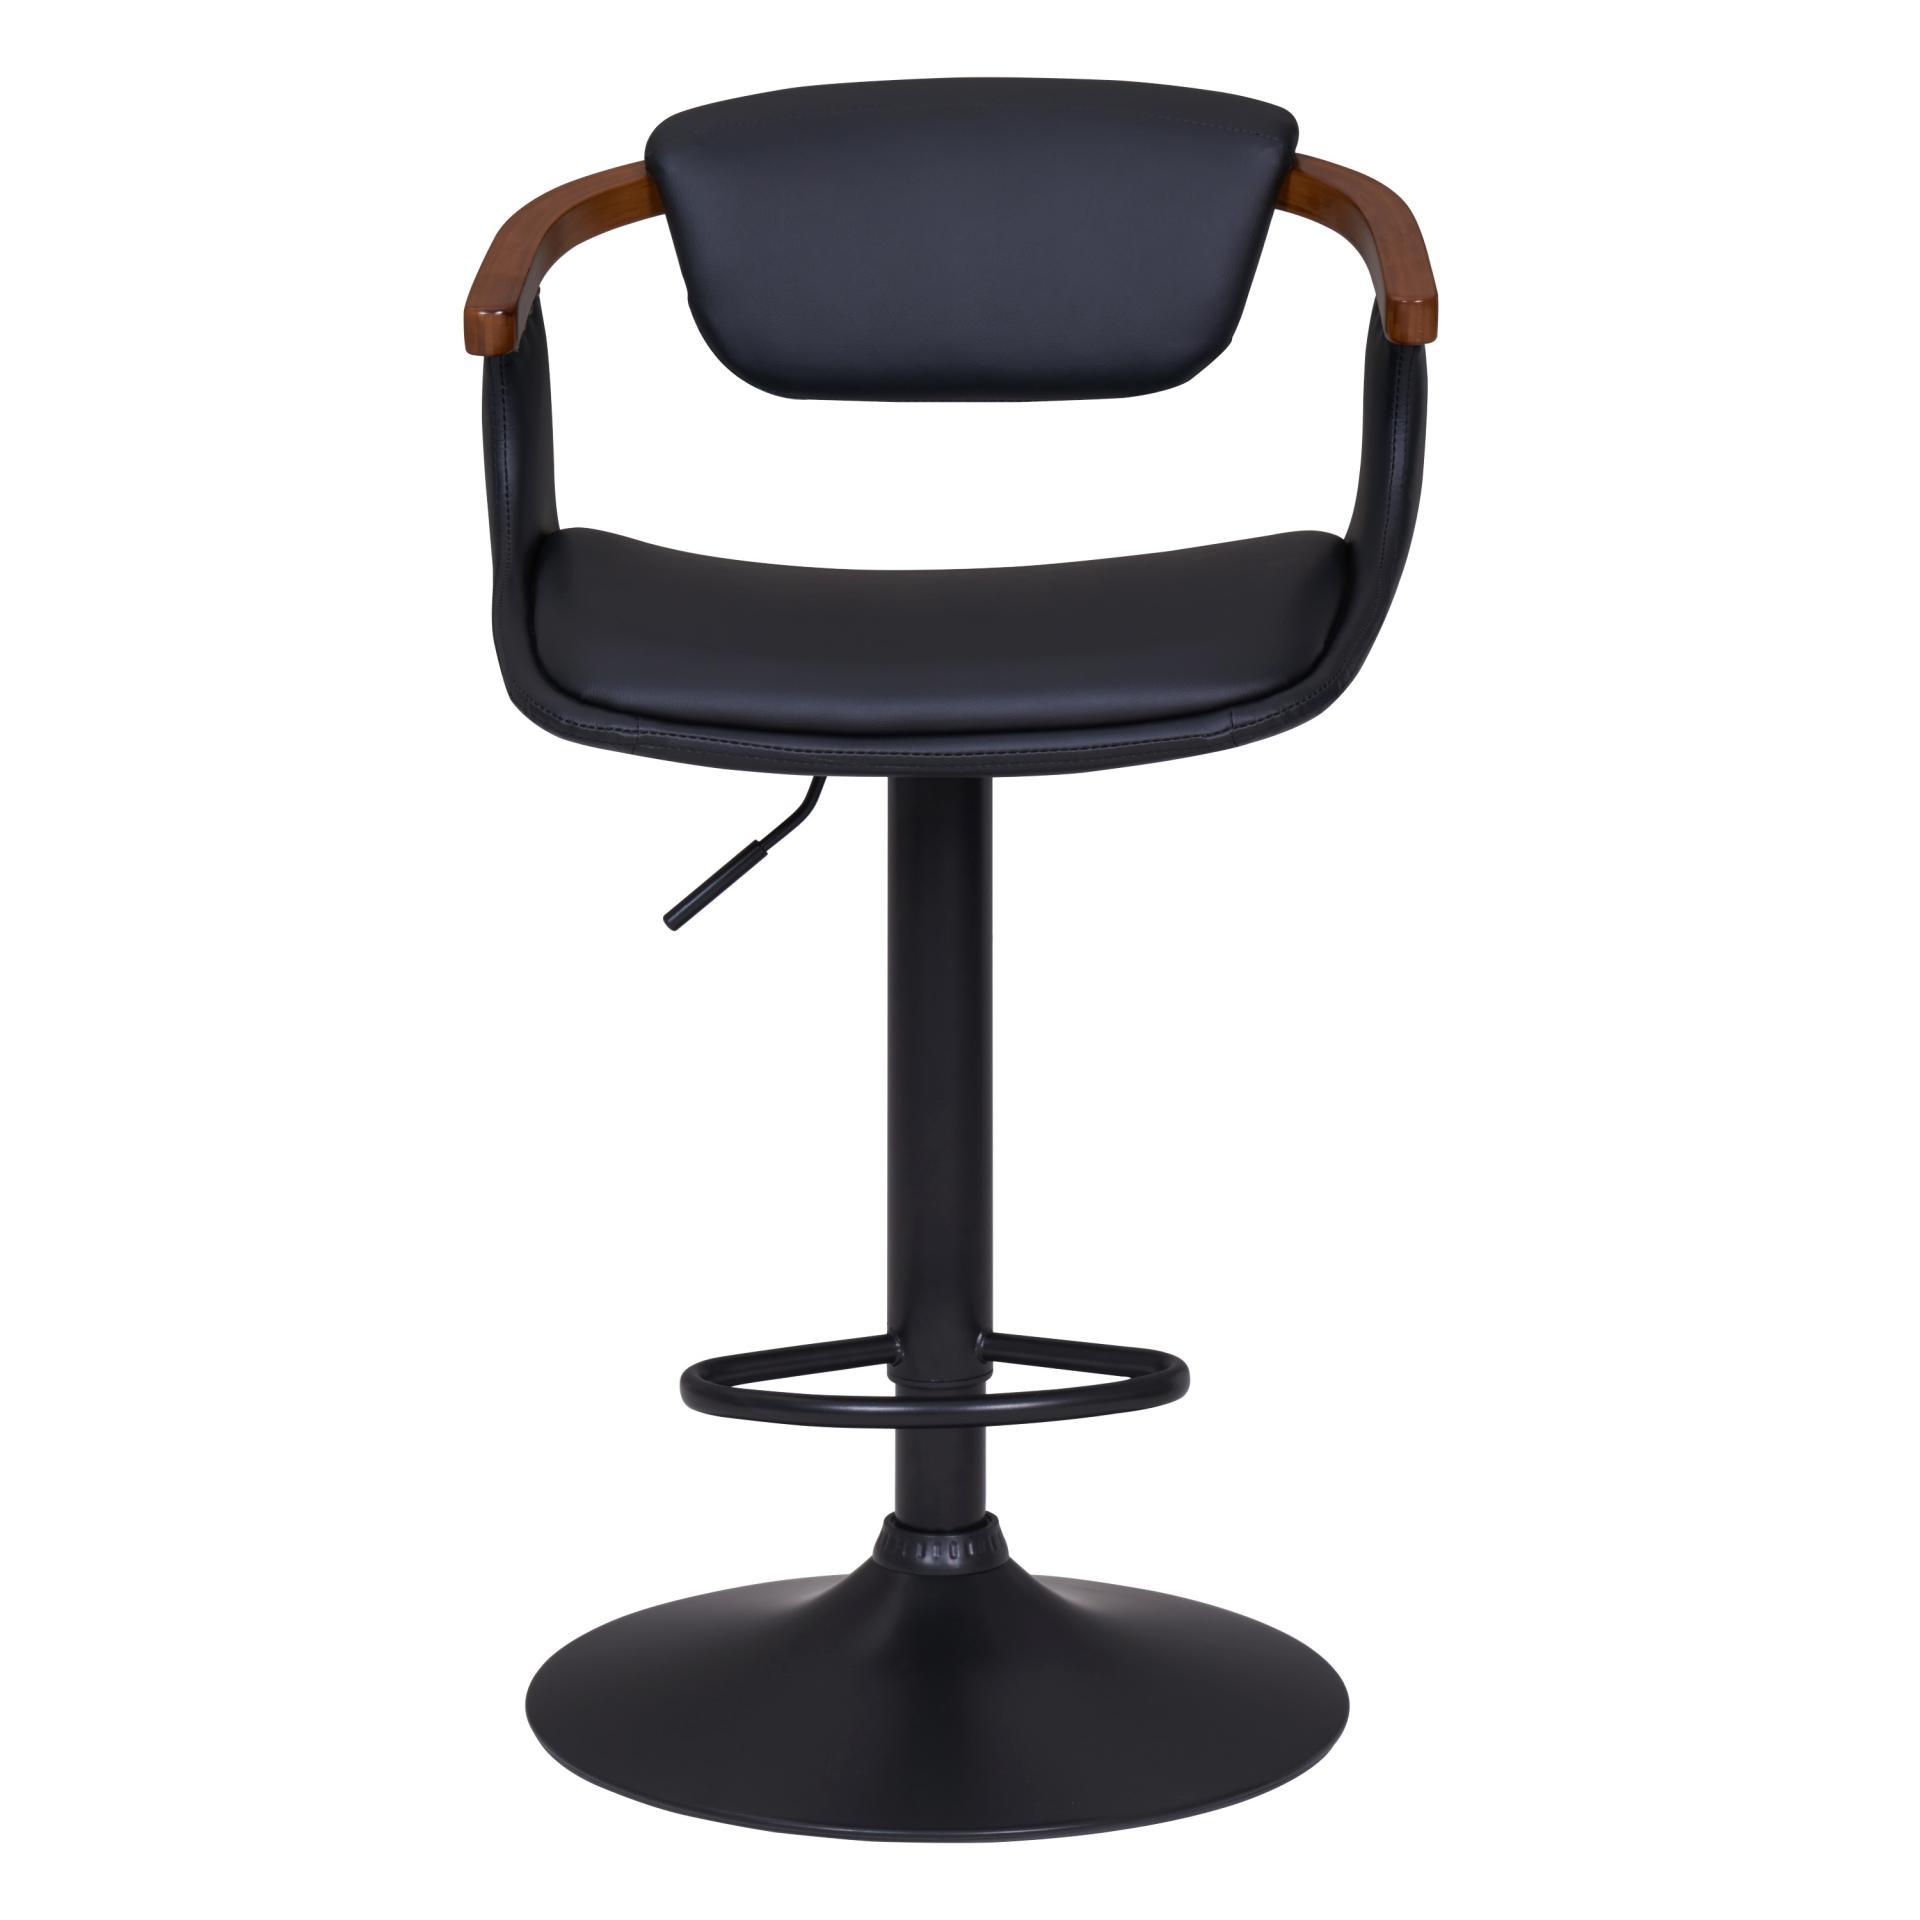 1160016 Bwl Npd Home Furniture Wholesale Lifestyle